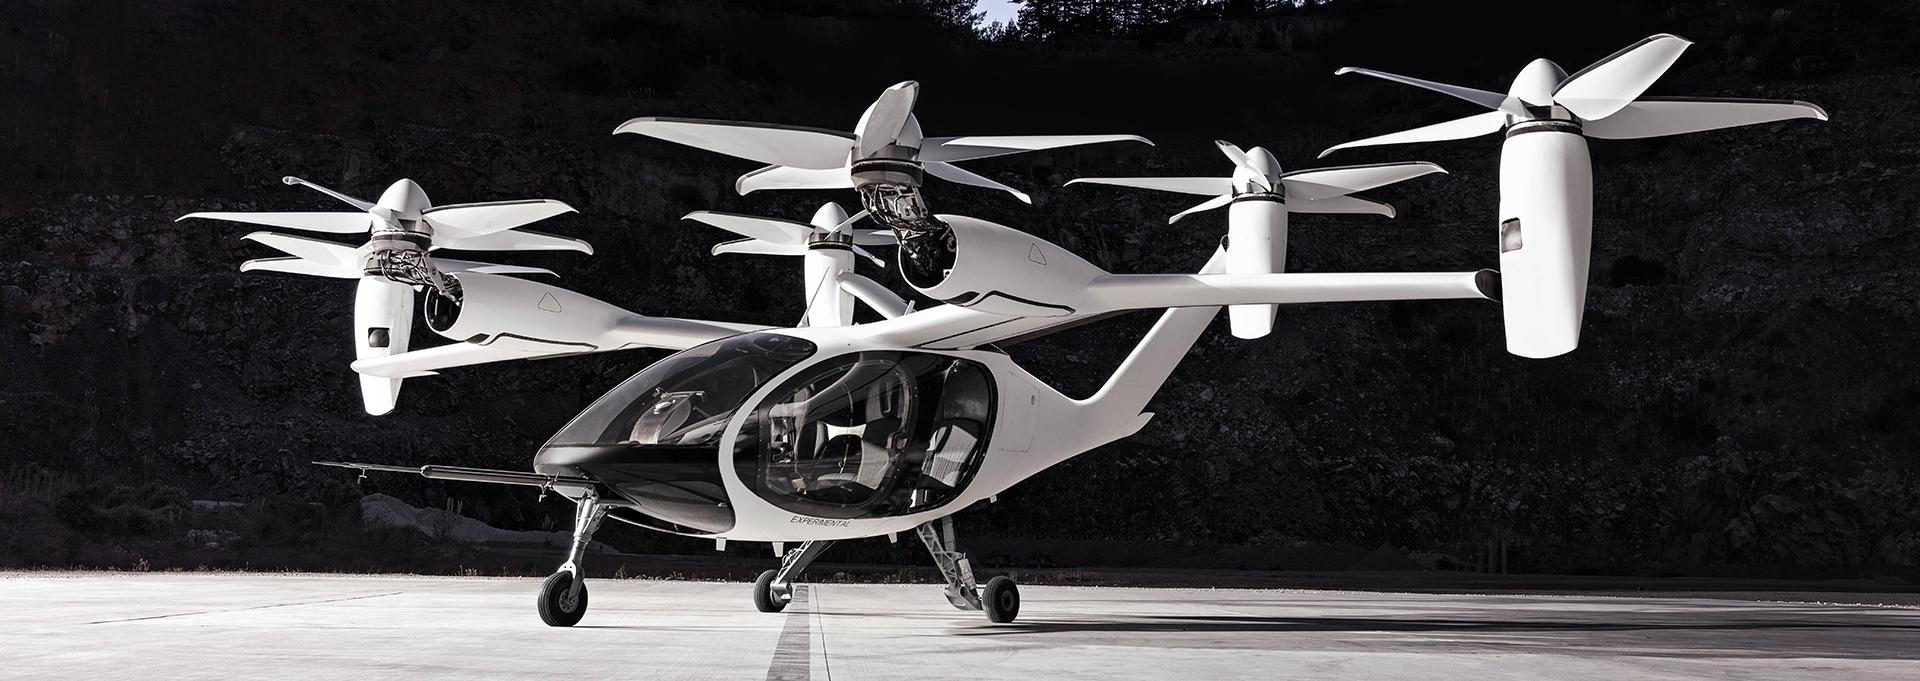 Toyota tiene un transporte alternativo, el eVTOL